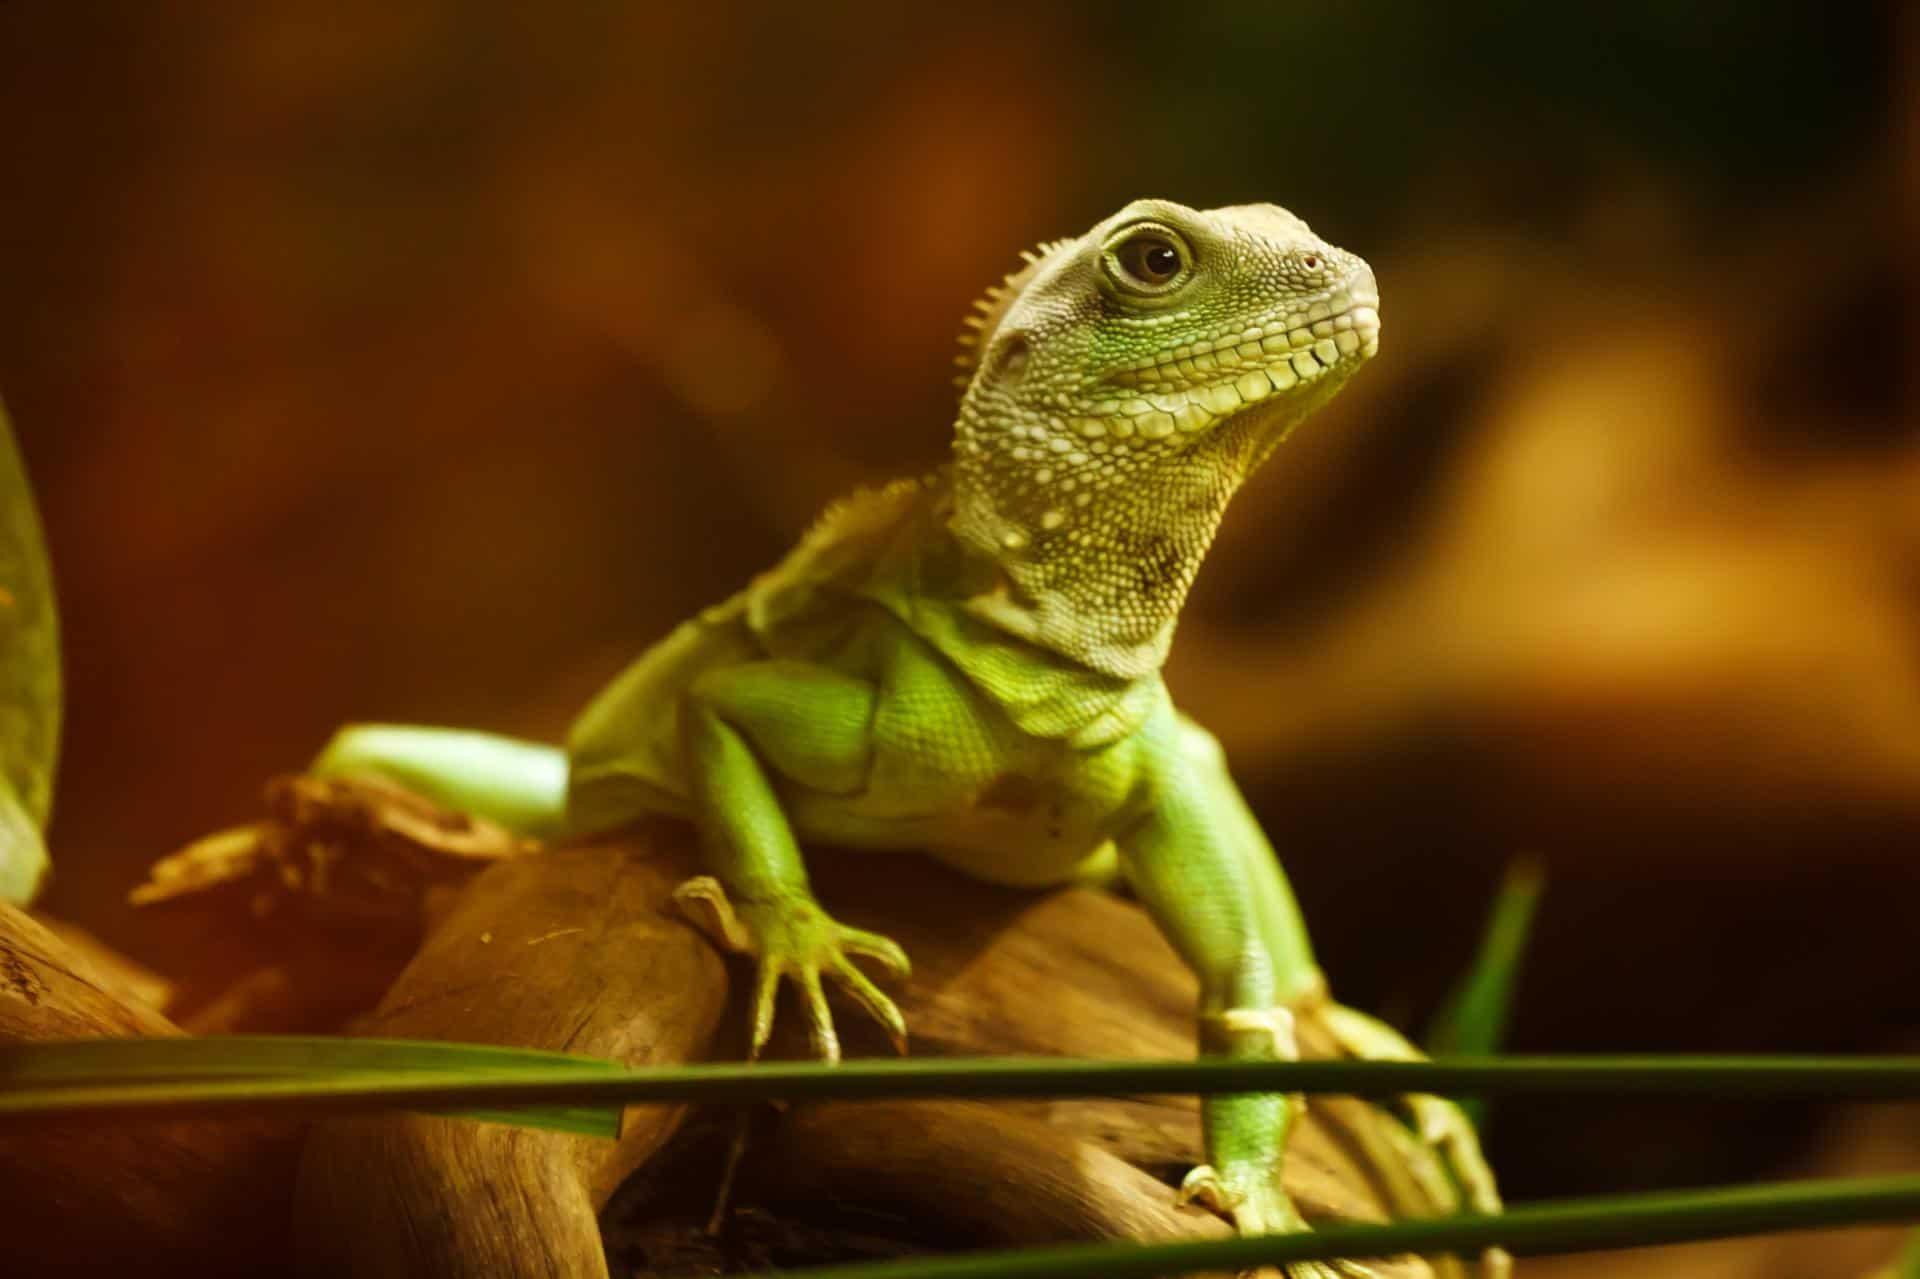 lizard 22258 1920 - AgroEcosun